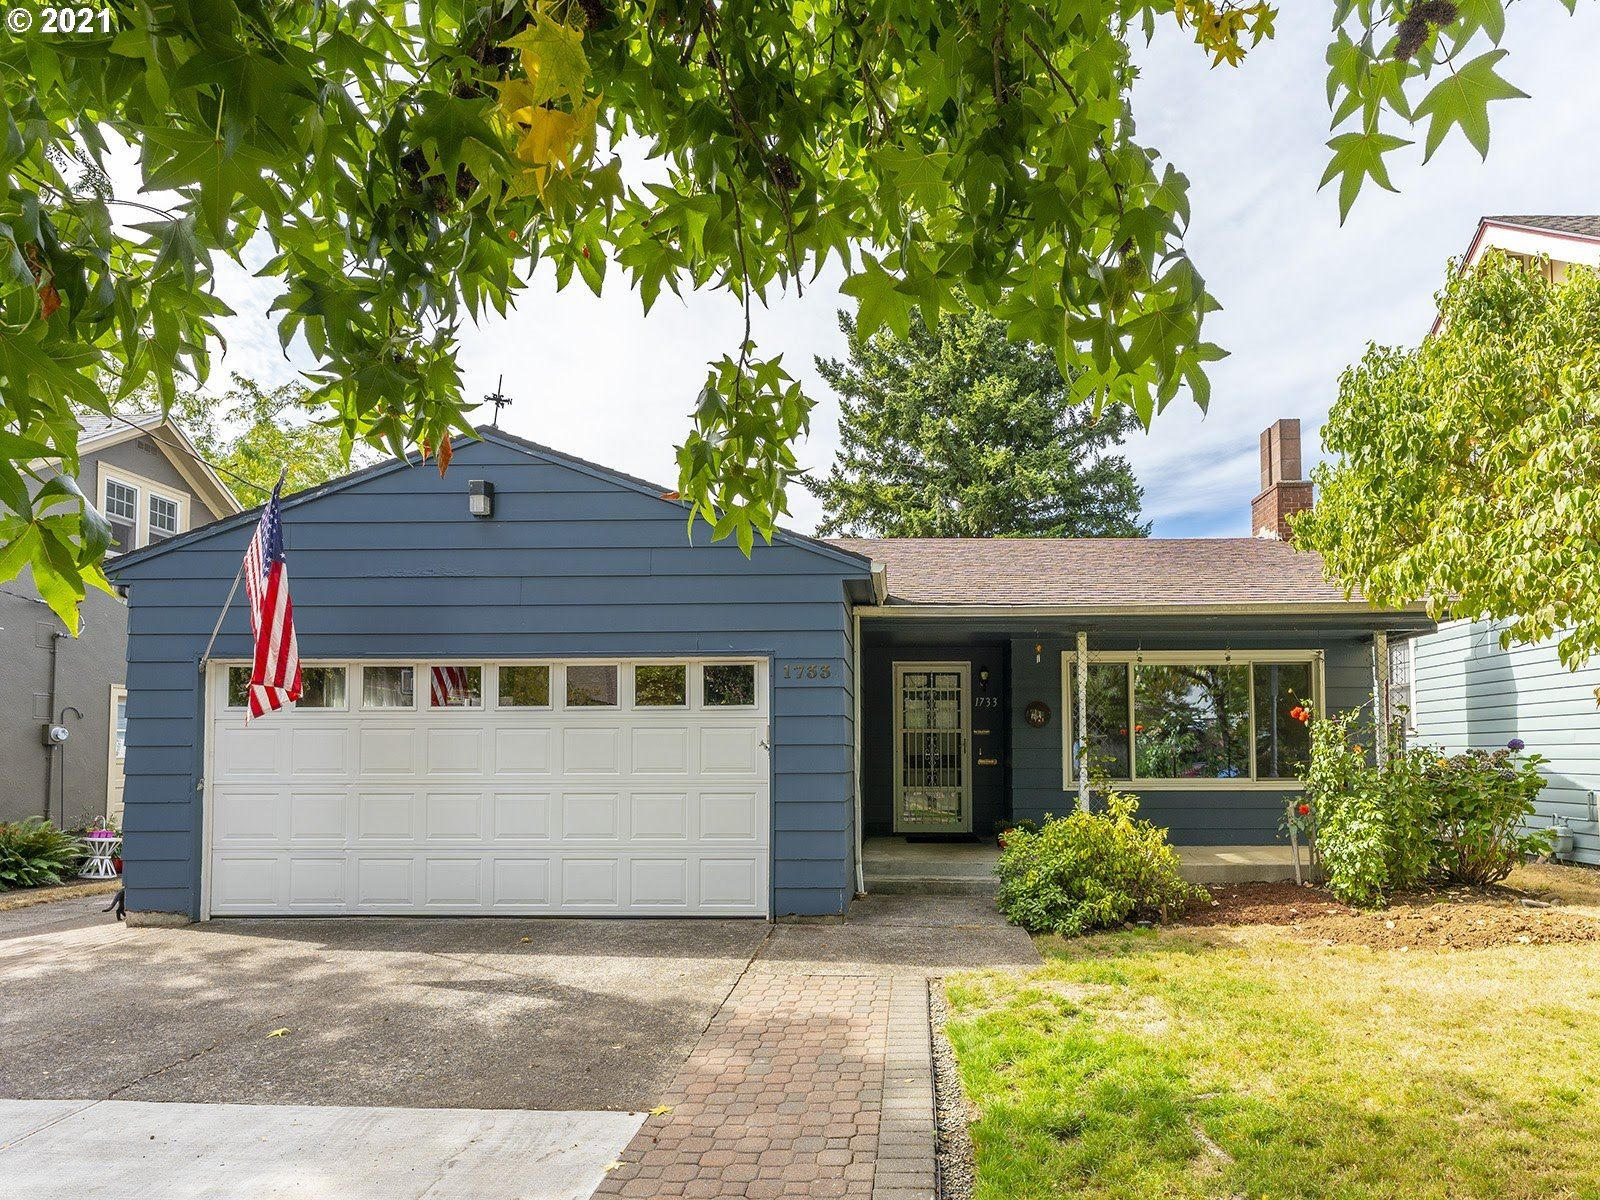 1733 NE 54TH AVE, Portland, OR 97213 - MLS#: 21116201